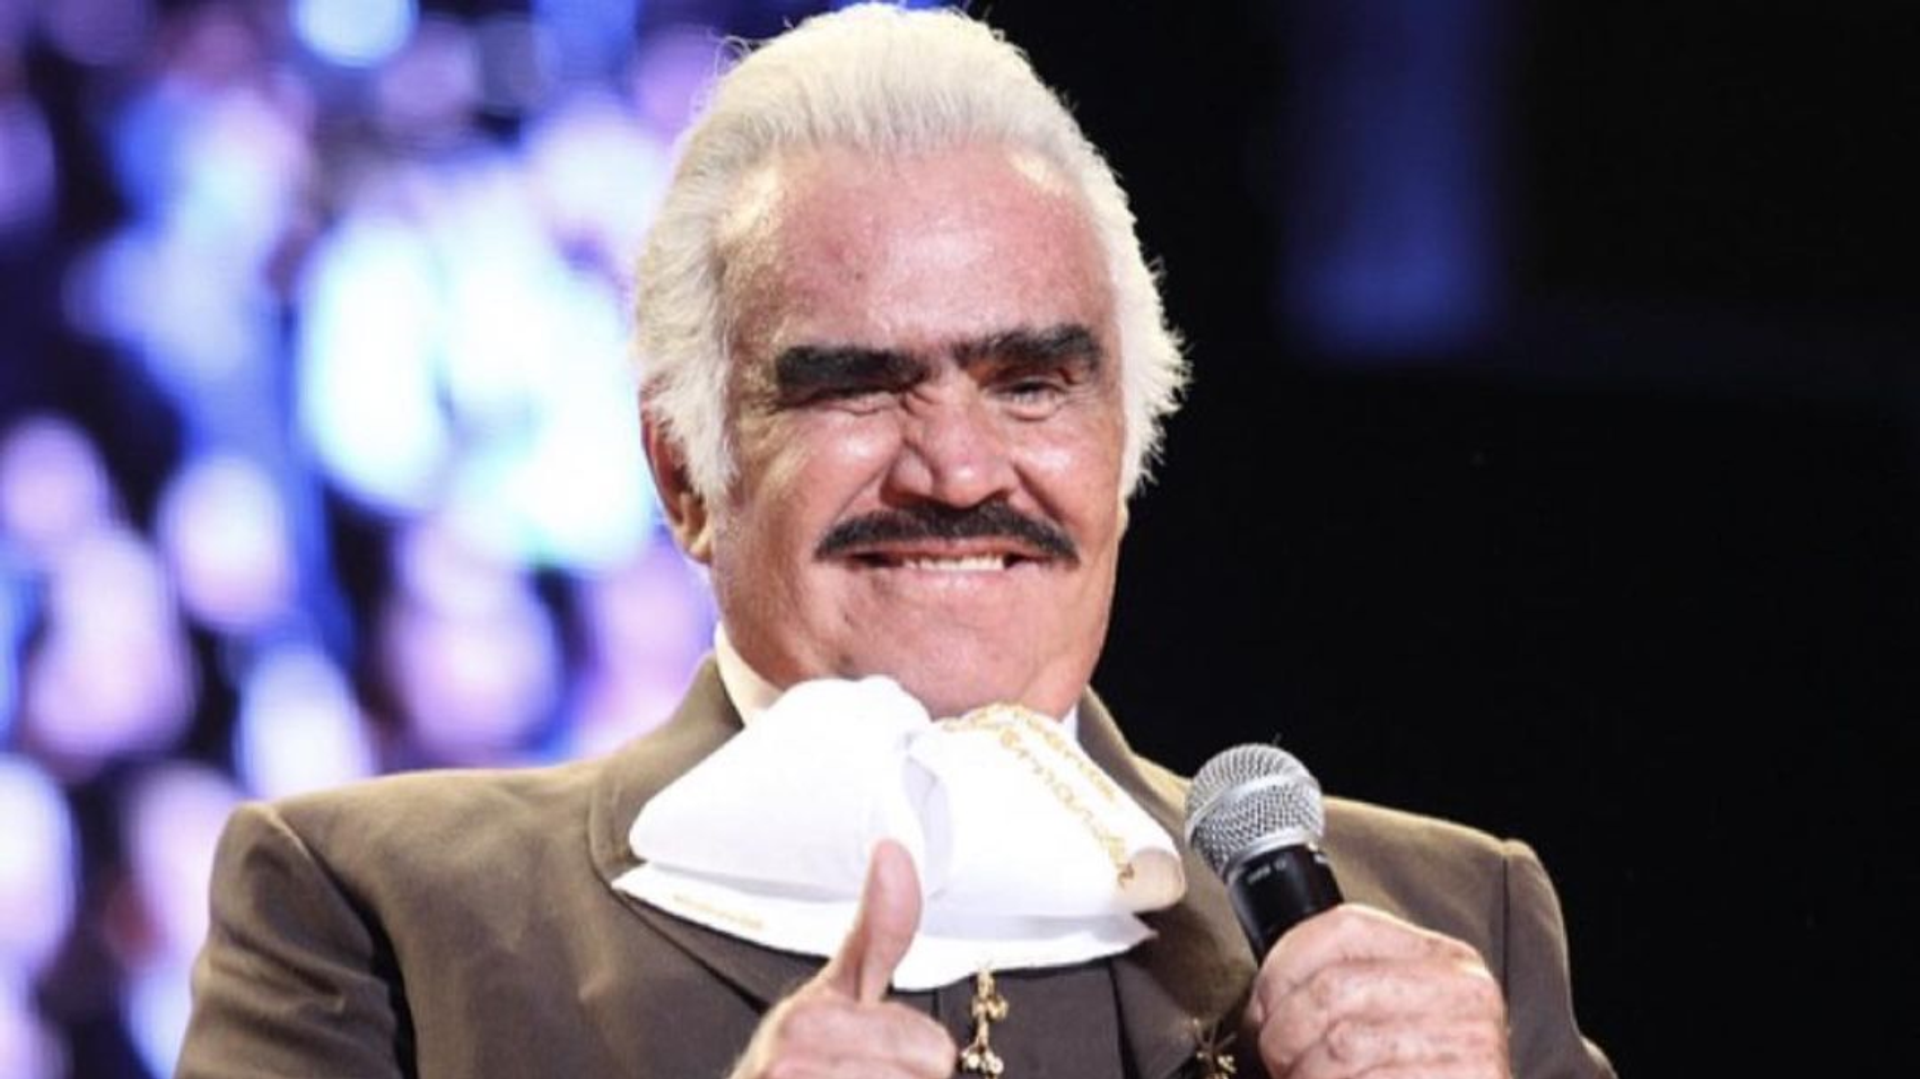 Vicente Fernández, cantante mexicano - Sputnik Mundo, 1920, 09.07.2021